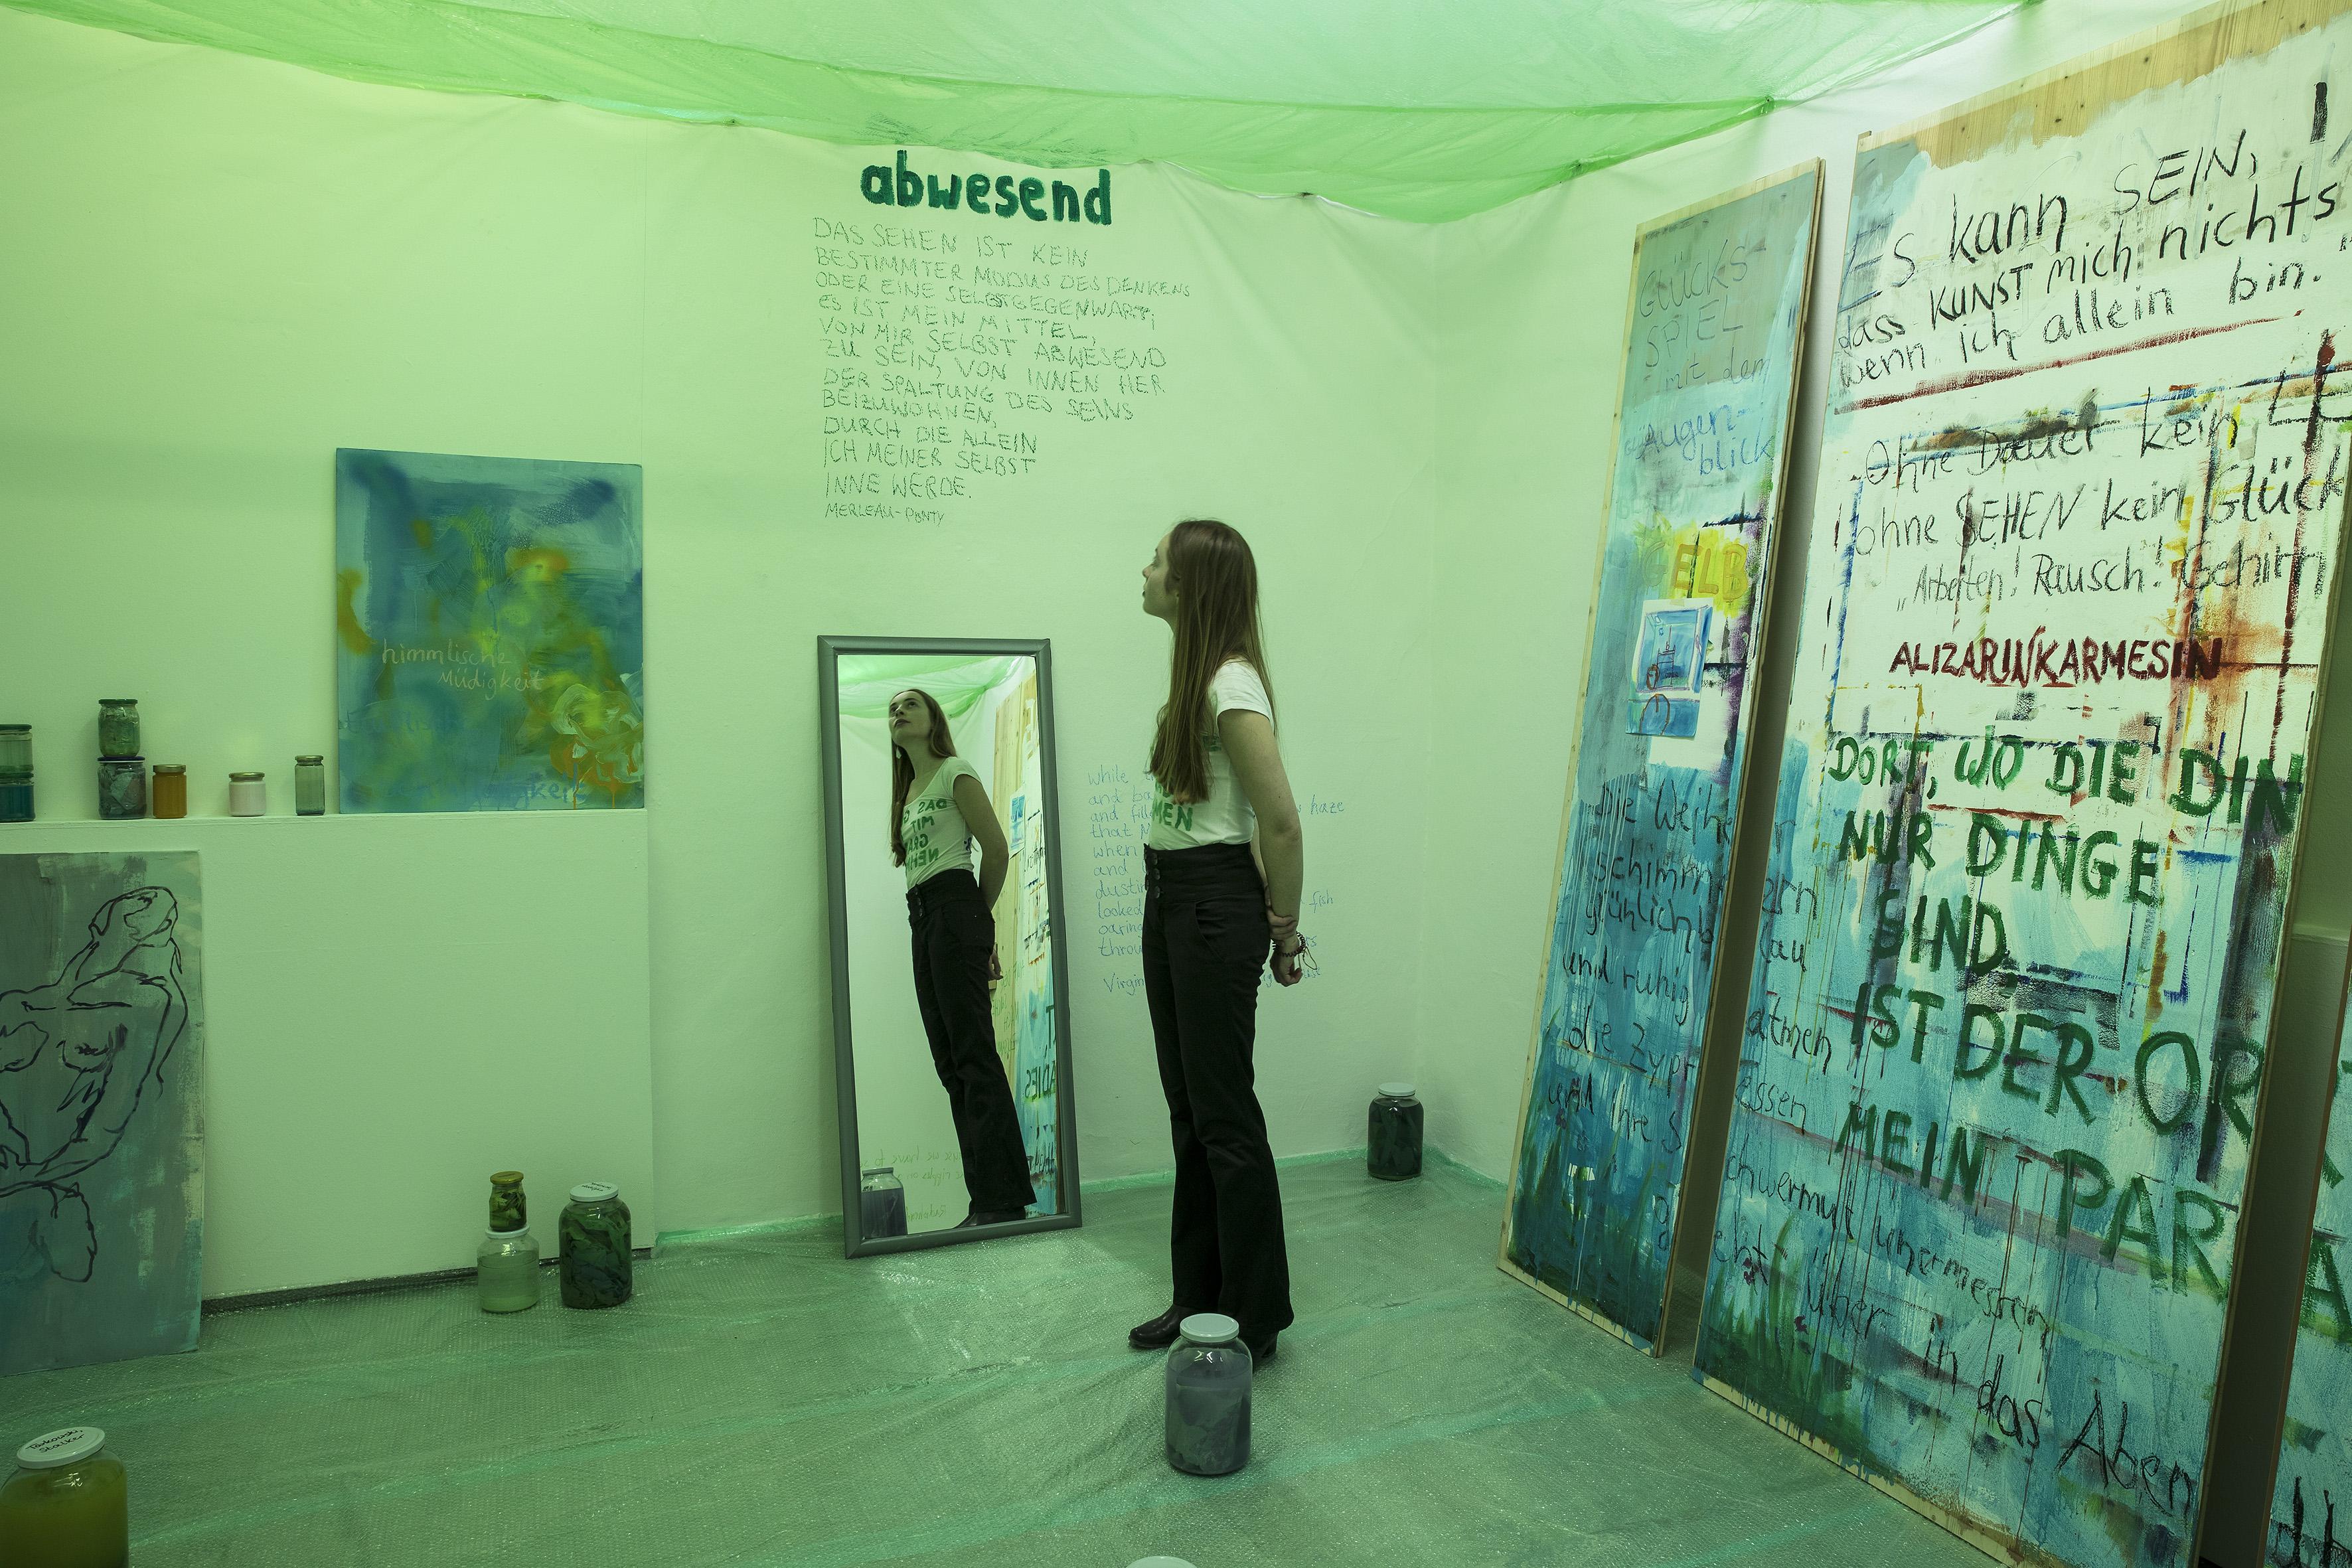 Klose Fenster im grünen kabinett koje klose